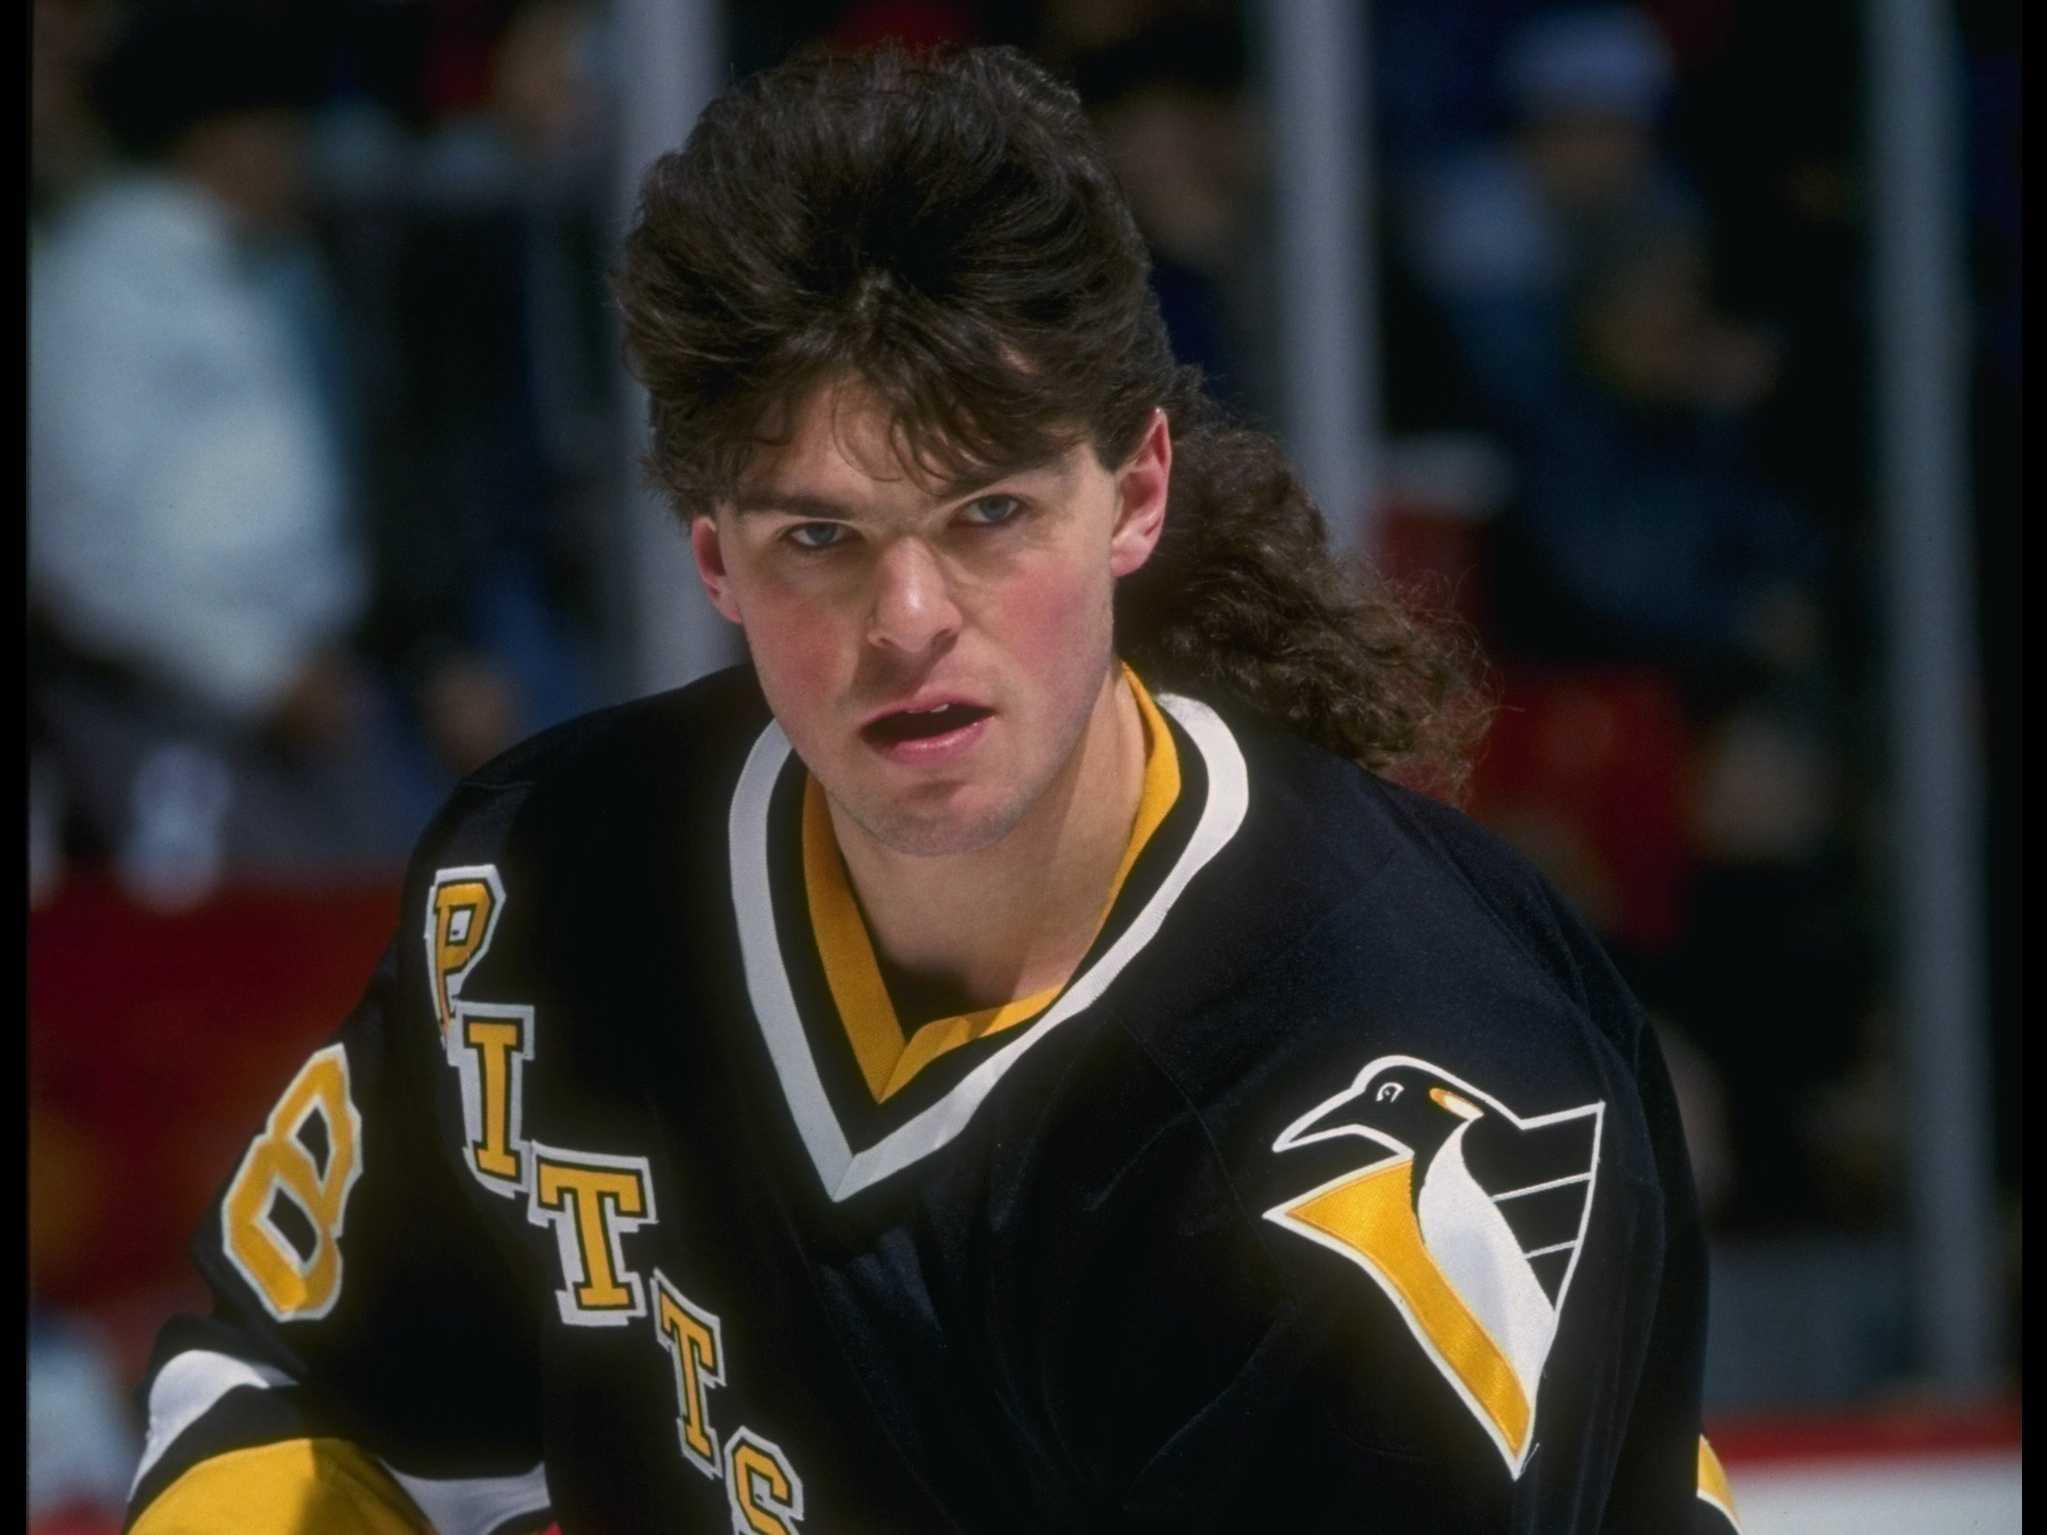 Bruins-star-jaromir-jagr-listed-his-favorite-player-growing-up-as-jaromir-jagr